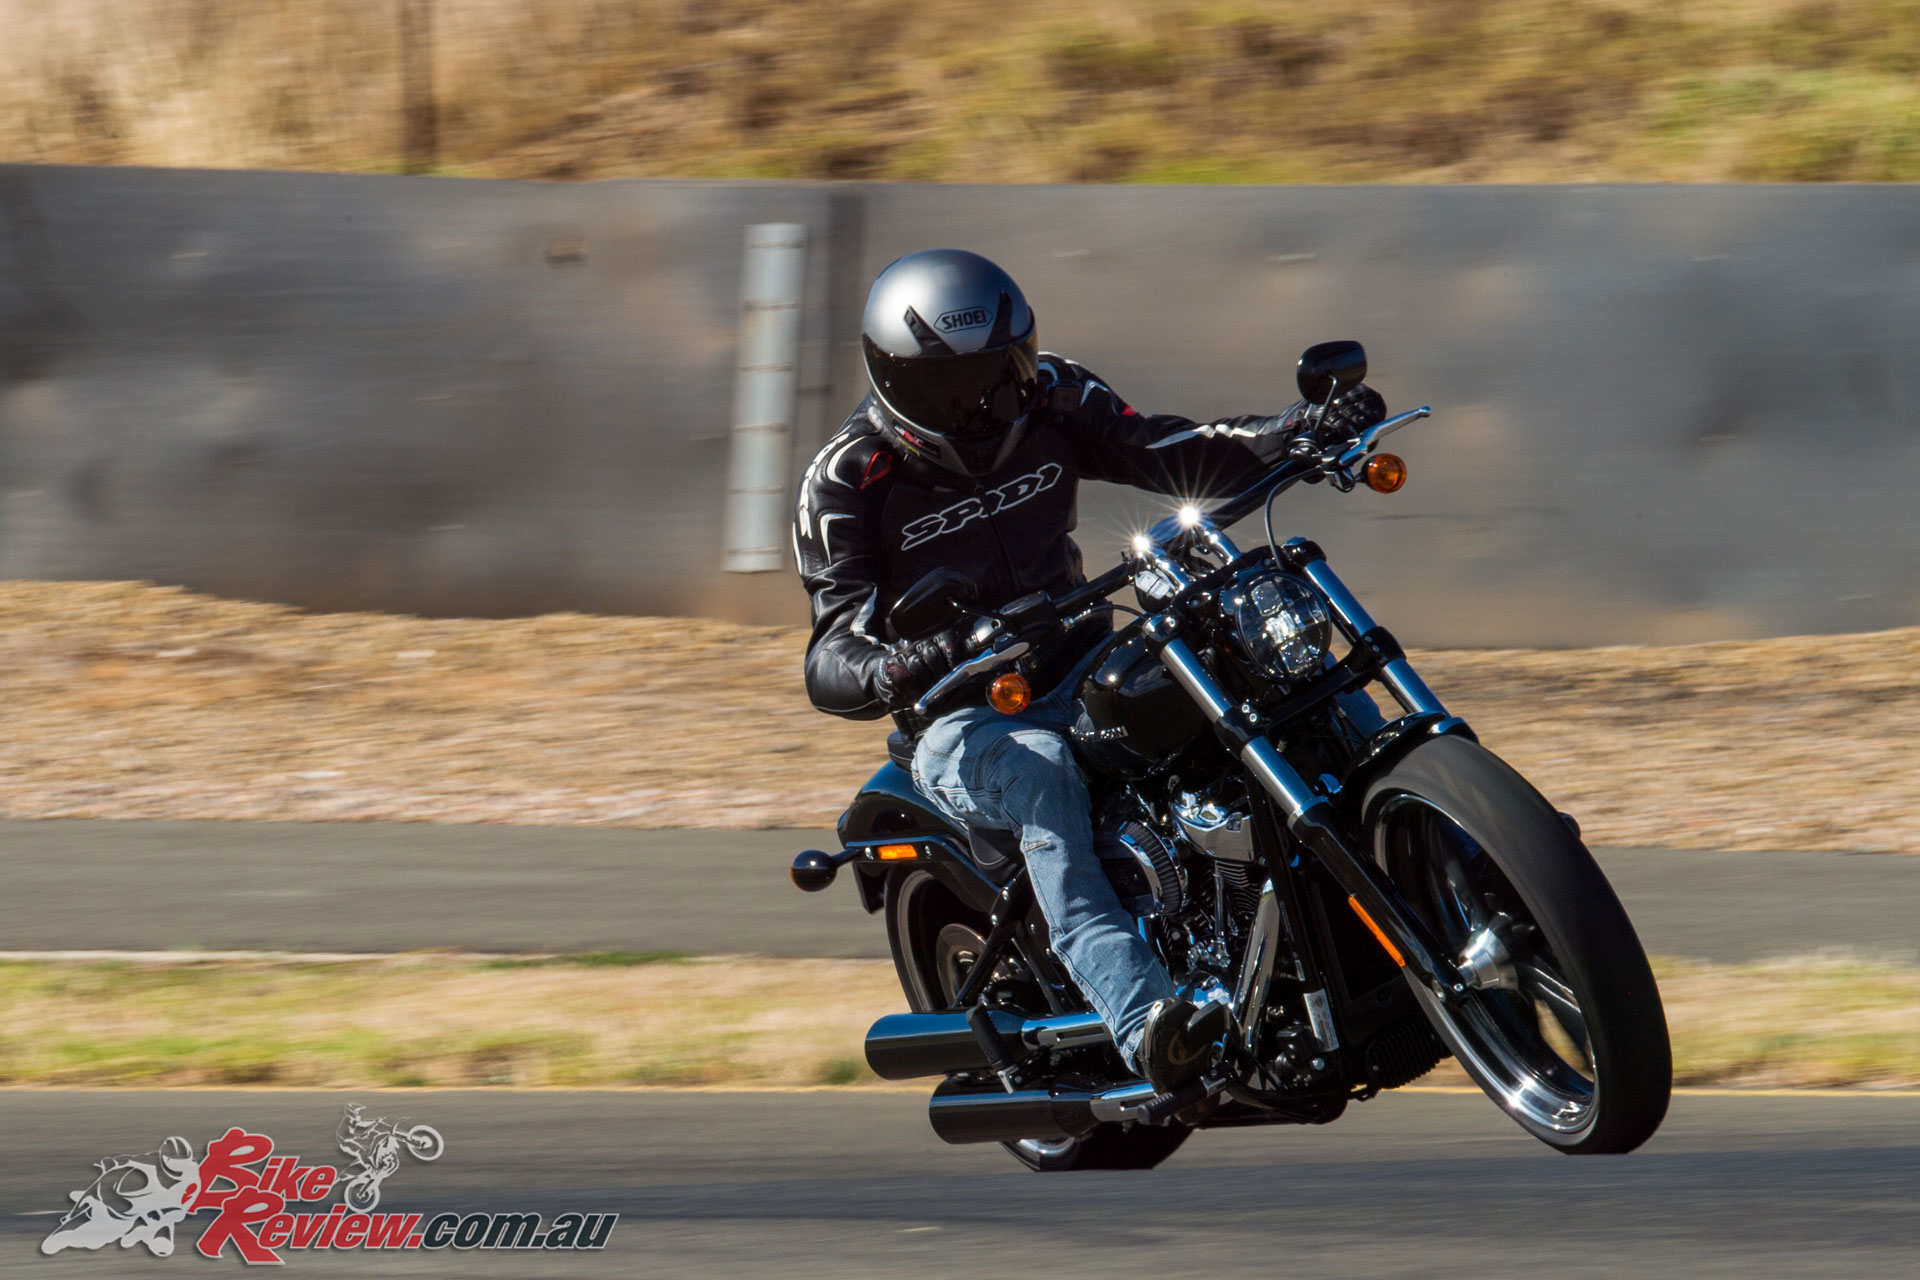 2019 Harley-Davidson Softail Tour - Breakout 114